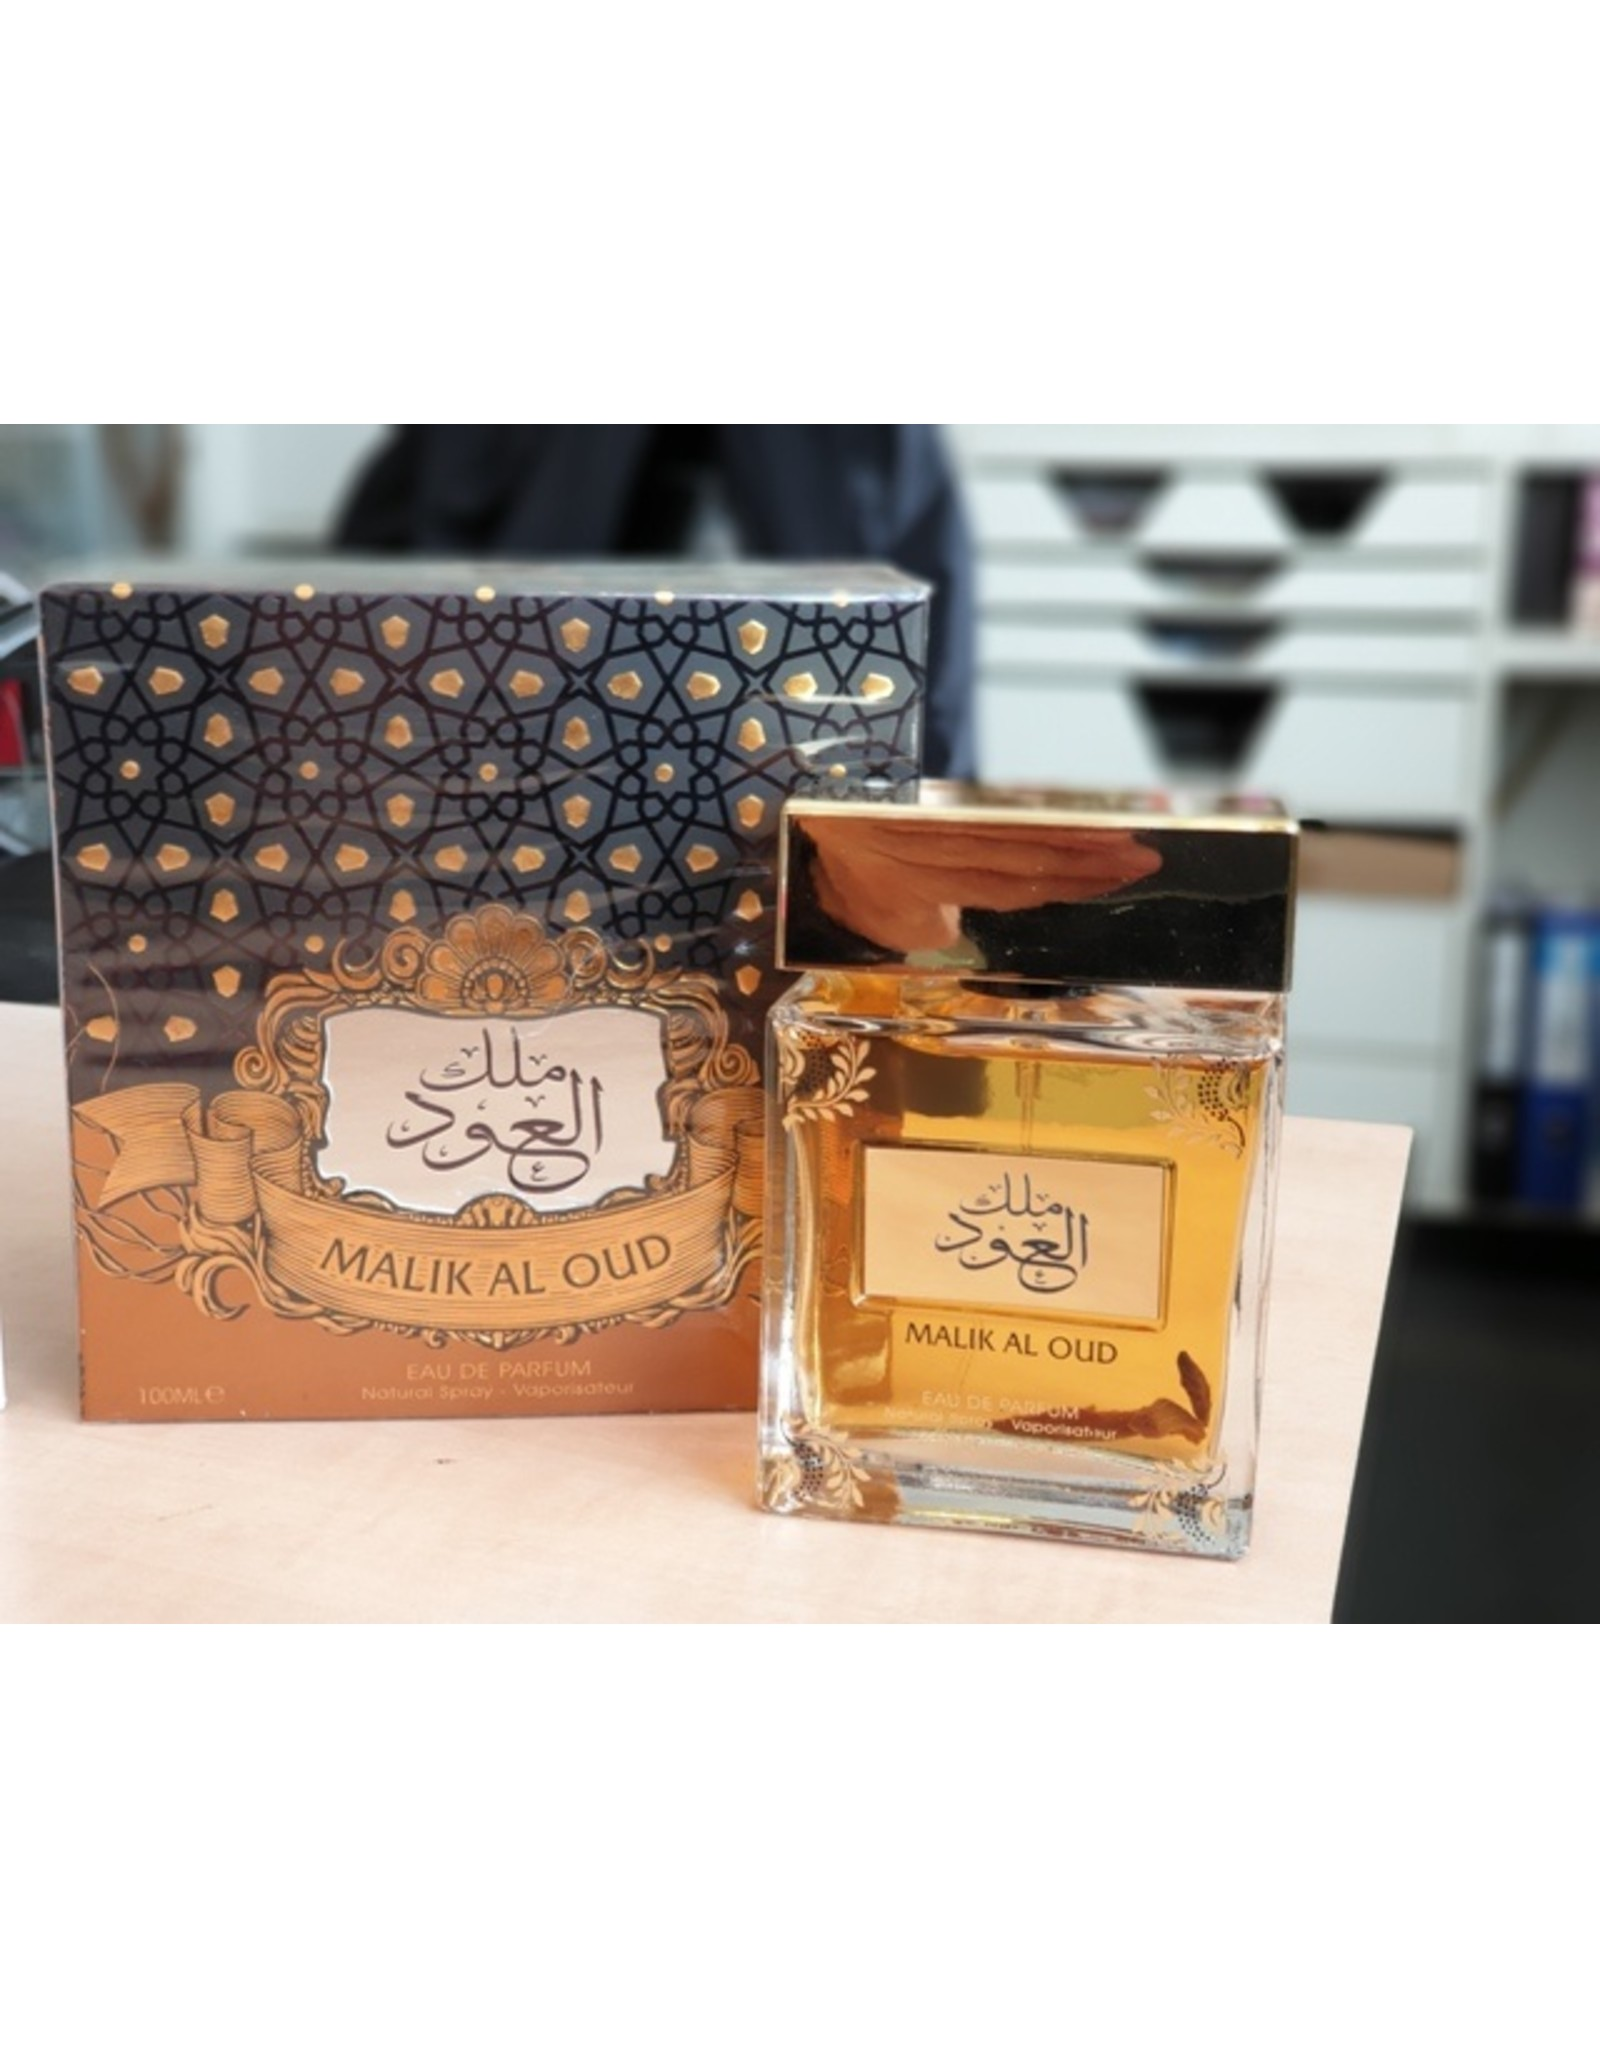 Niche Parfums Malik al Oud 100 ml EDP